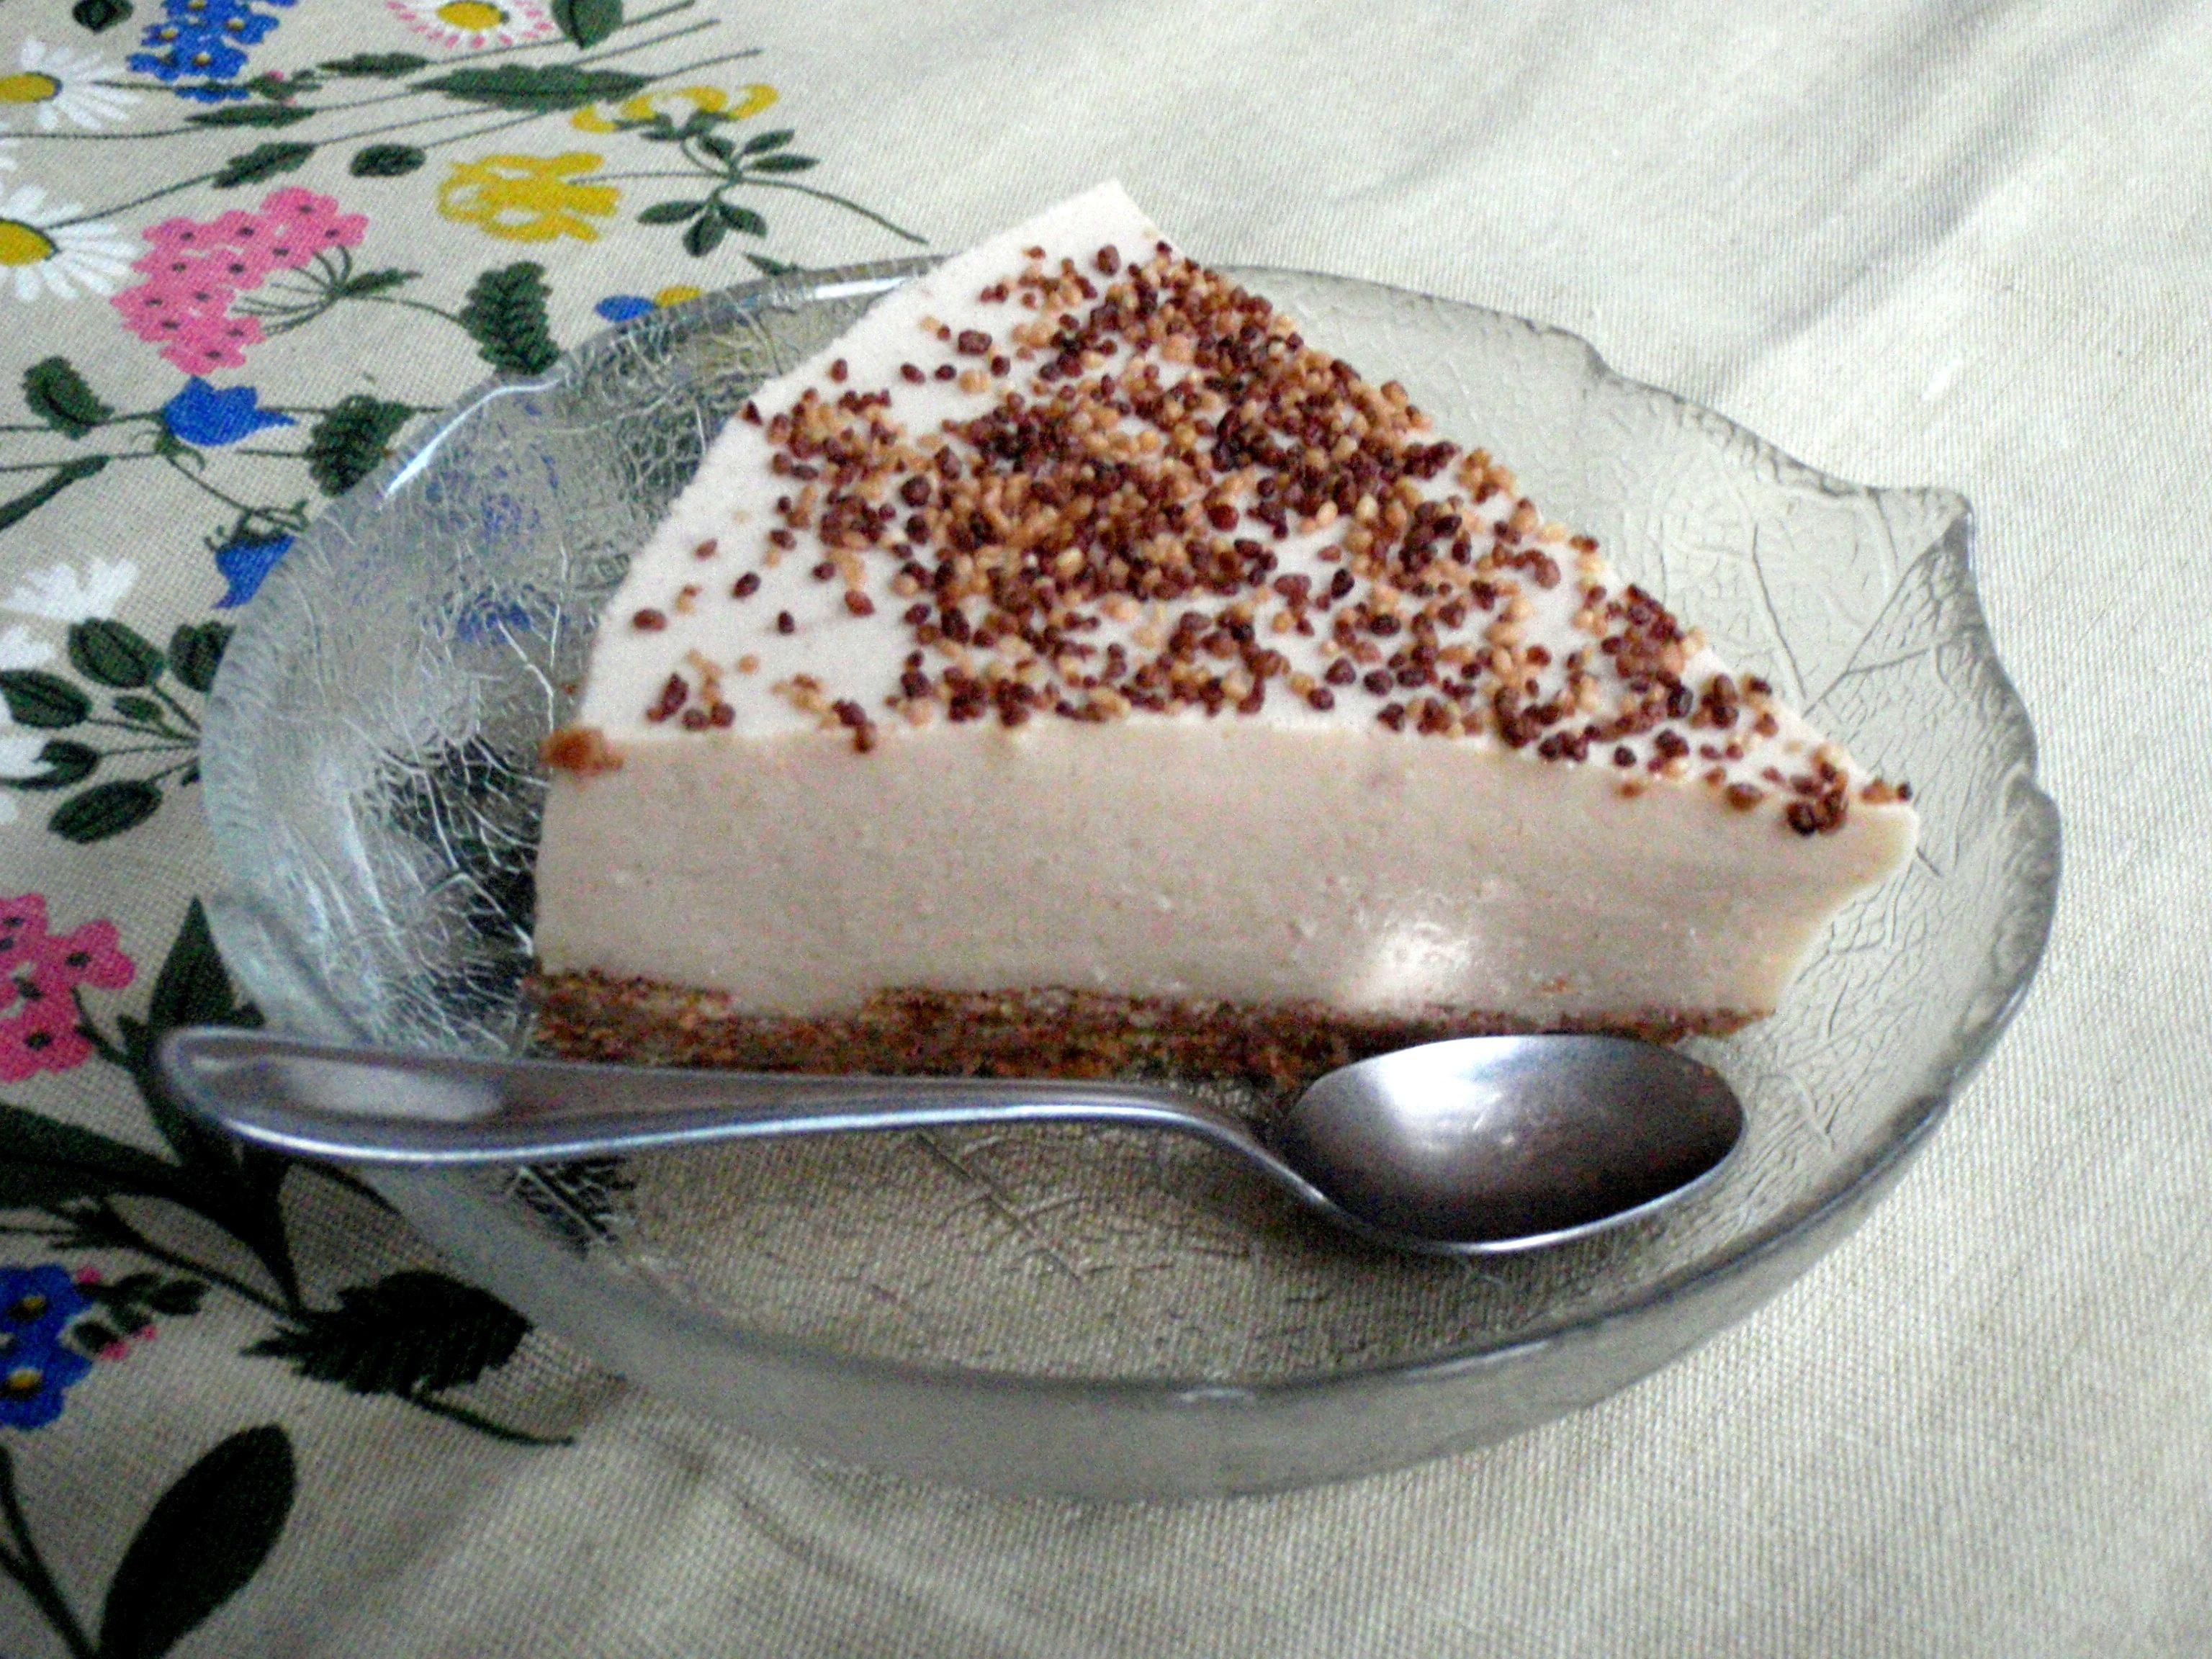 dajm cheesecake